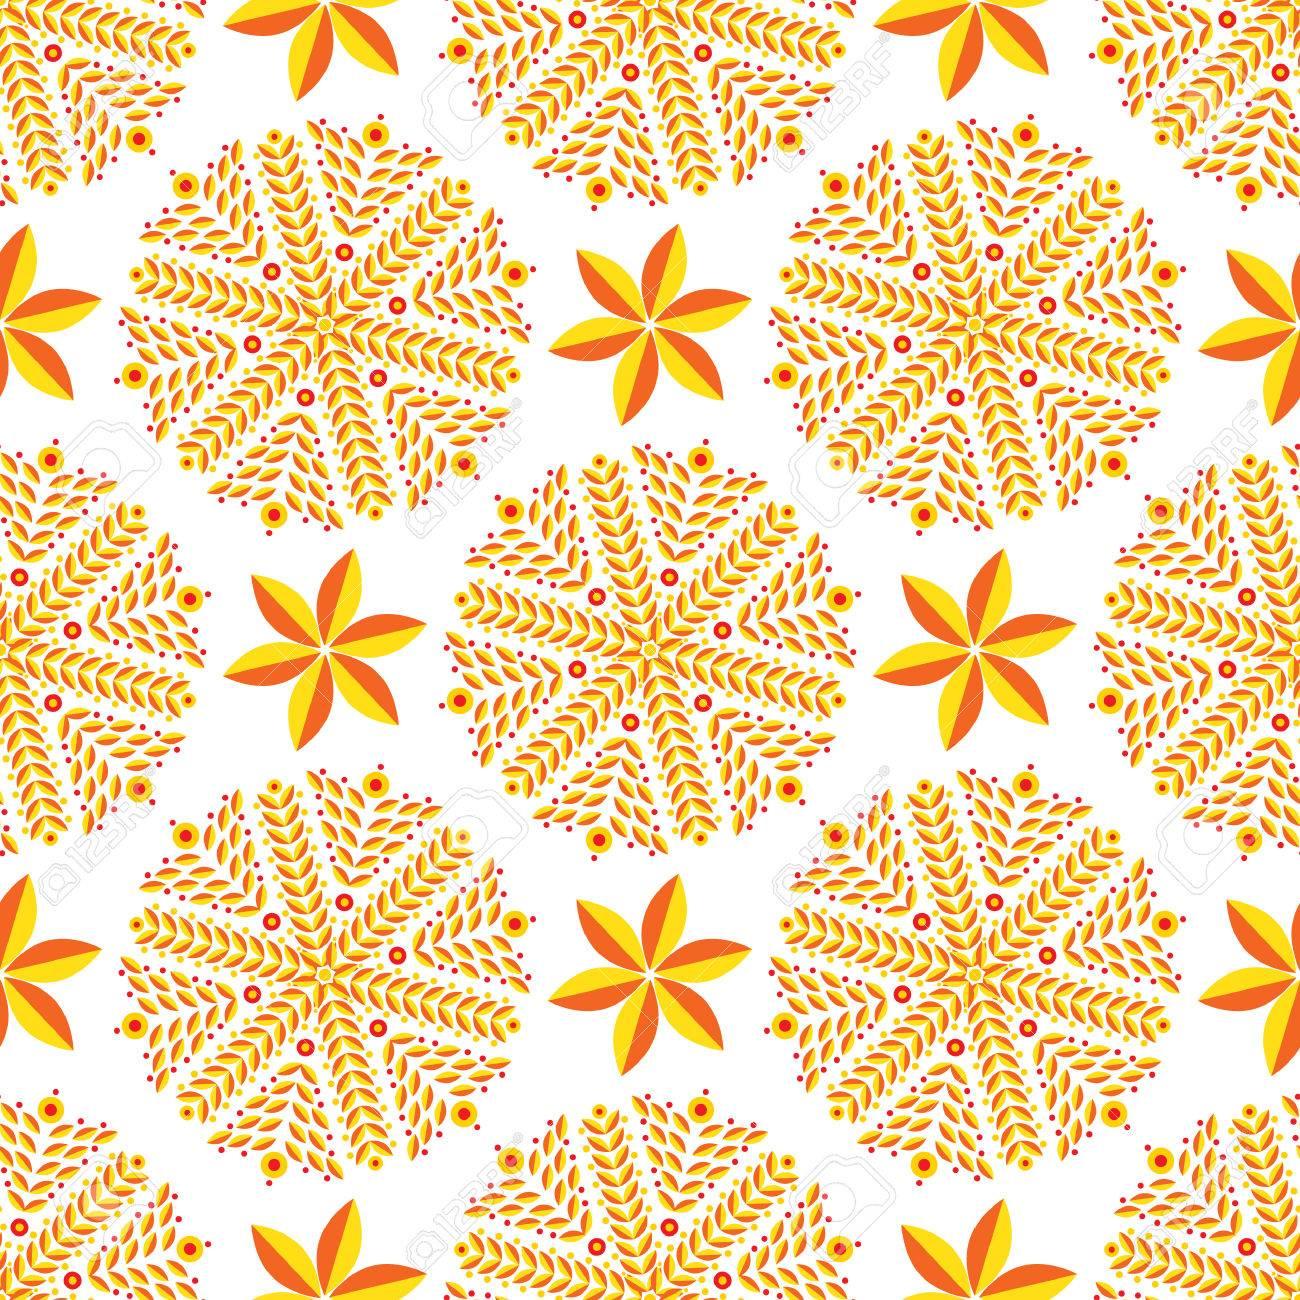 48322299 orange luxury background art deco for background wallpaper scrapbooking prints